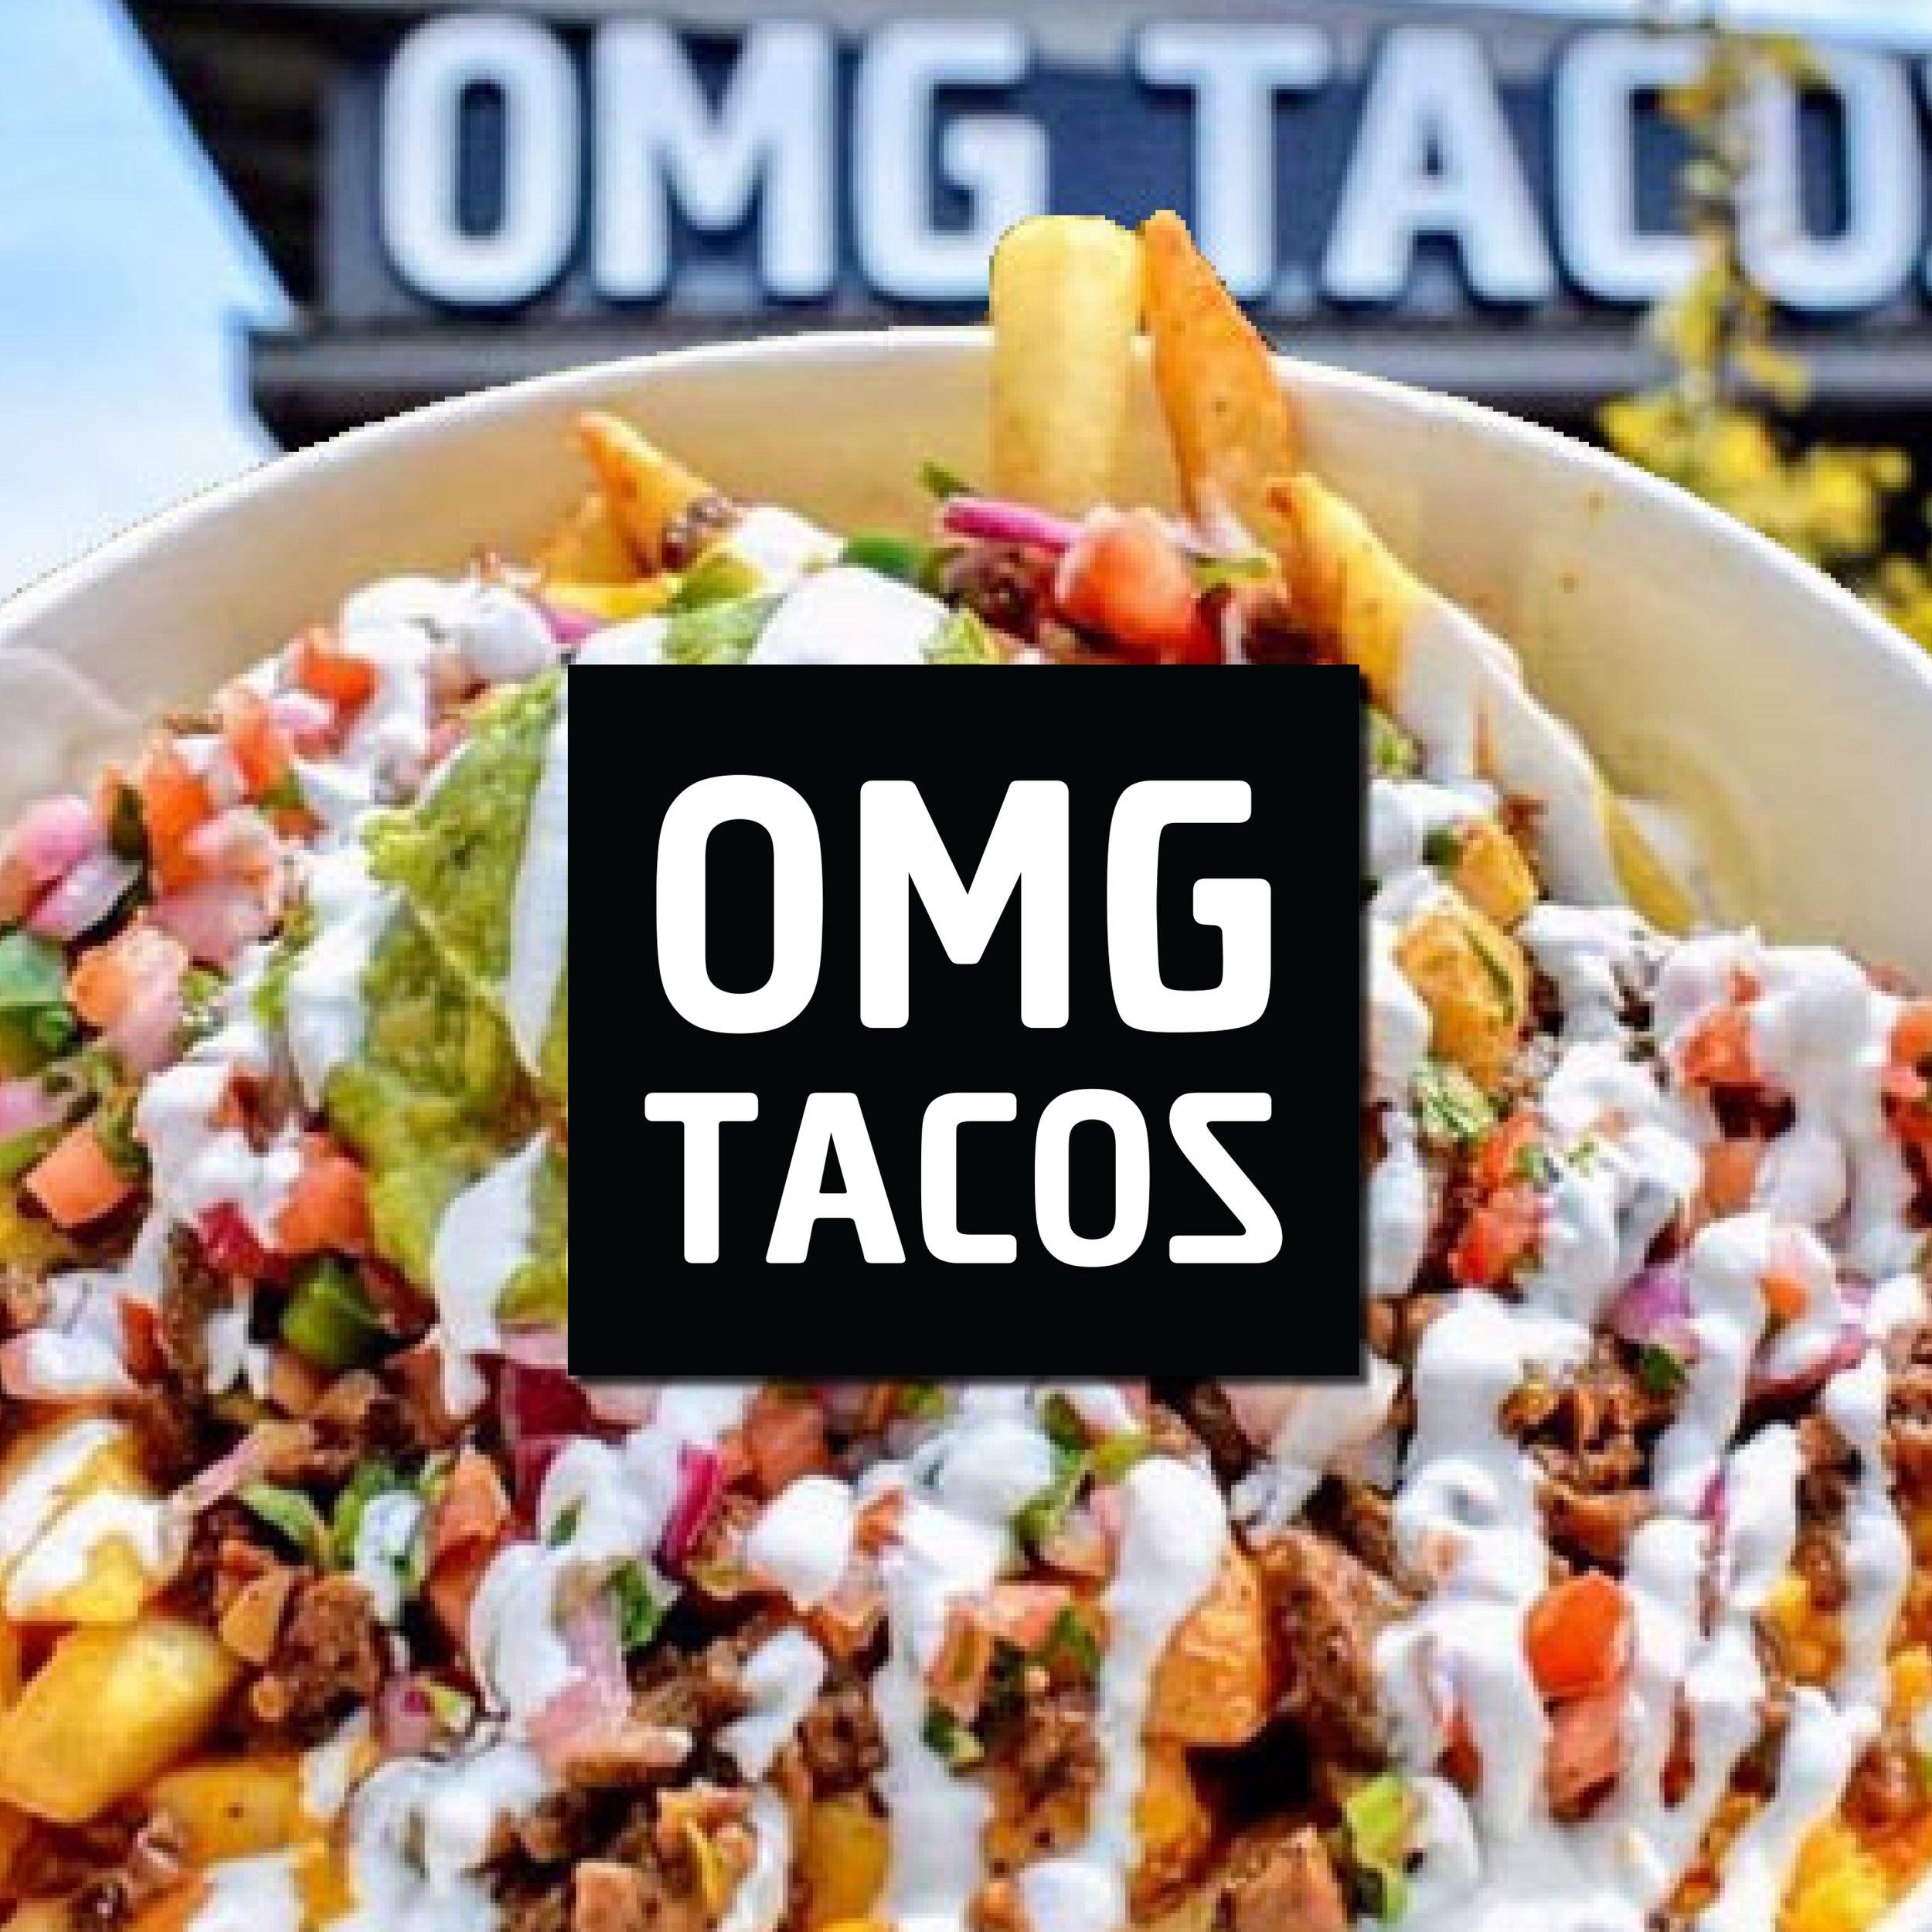 Street Tacos & More Open til 3am